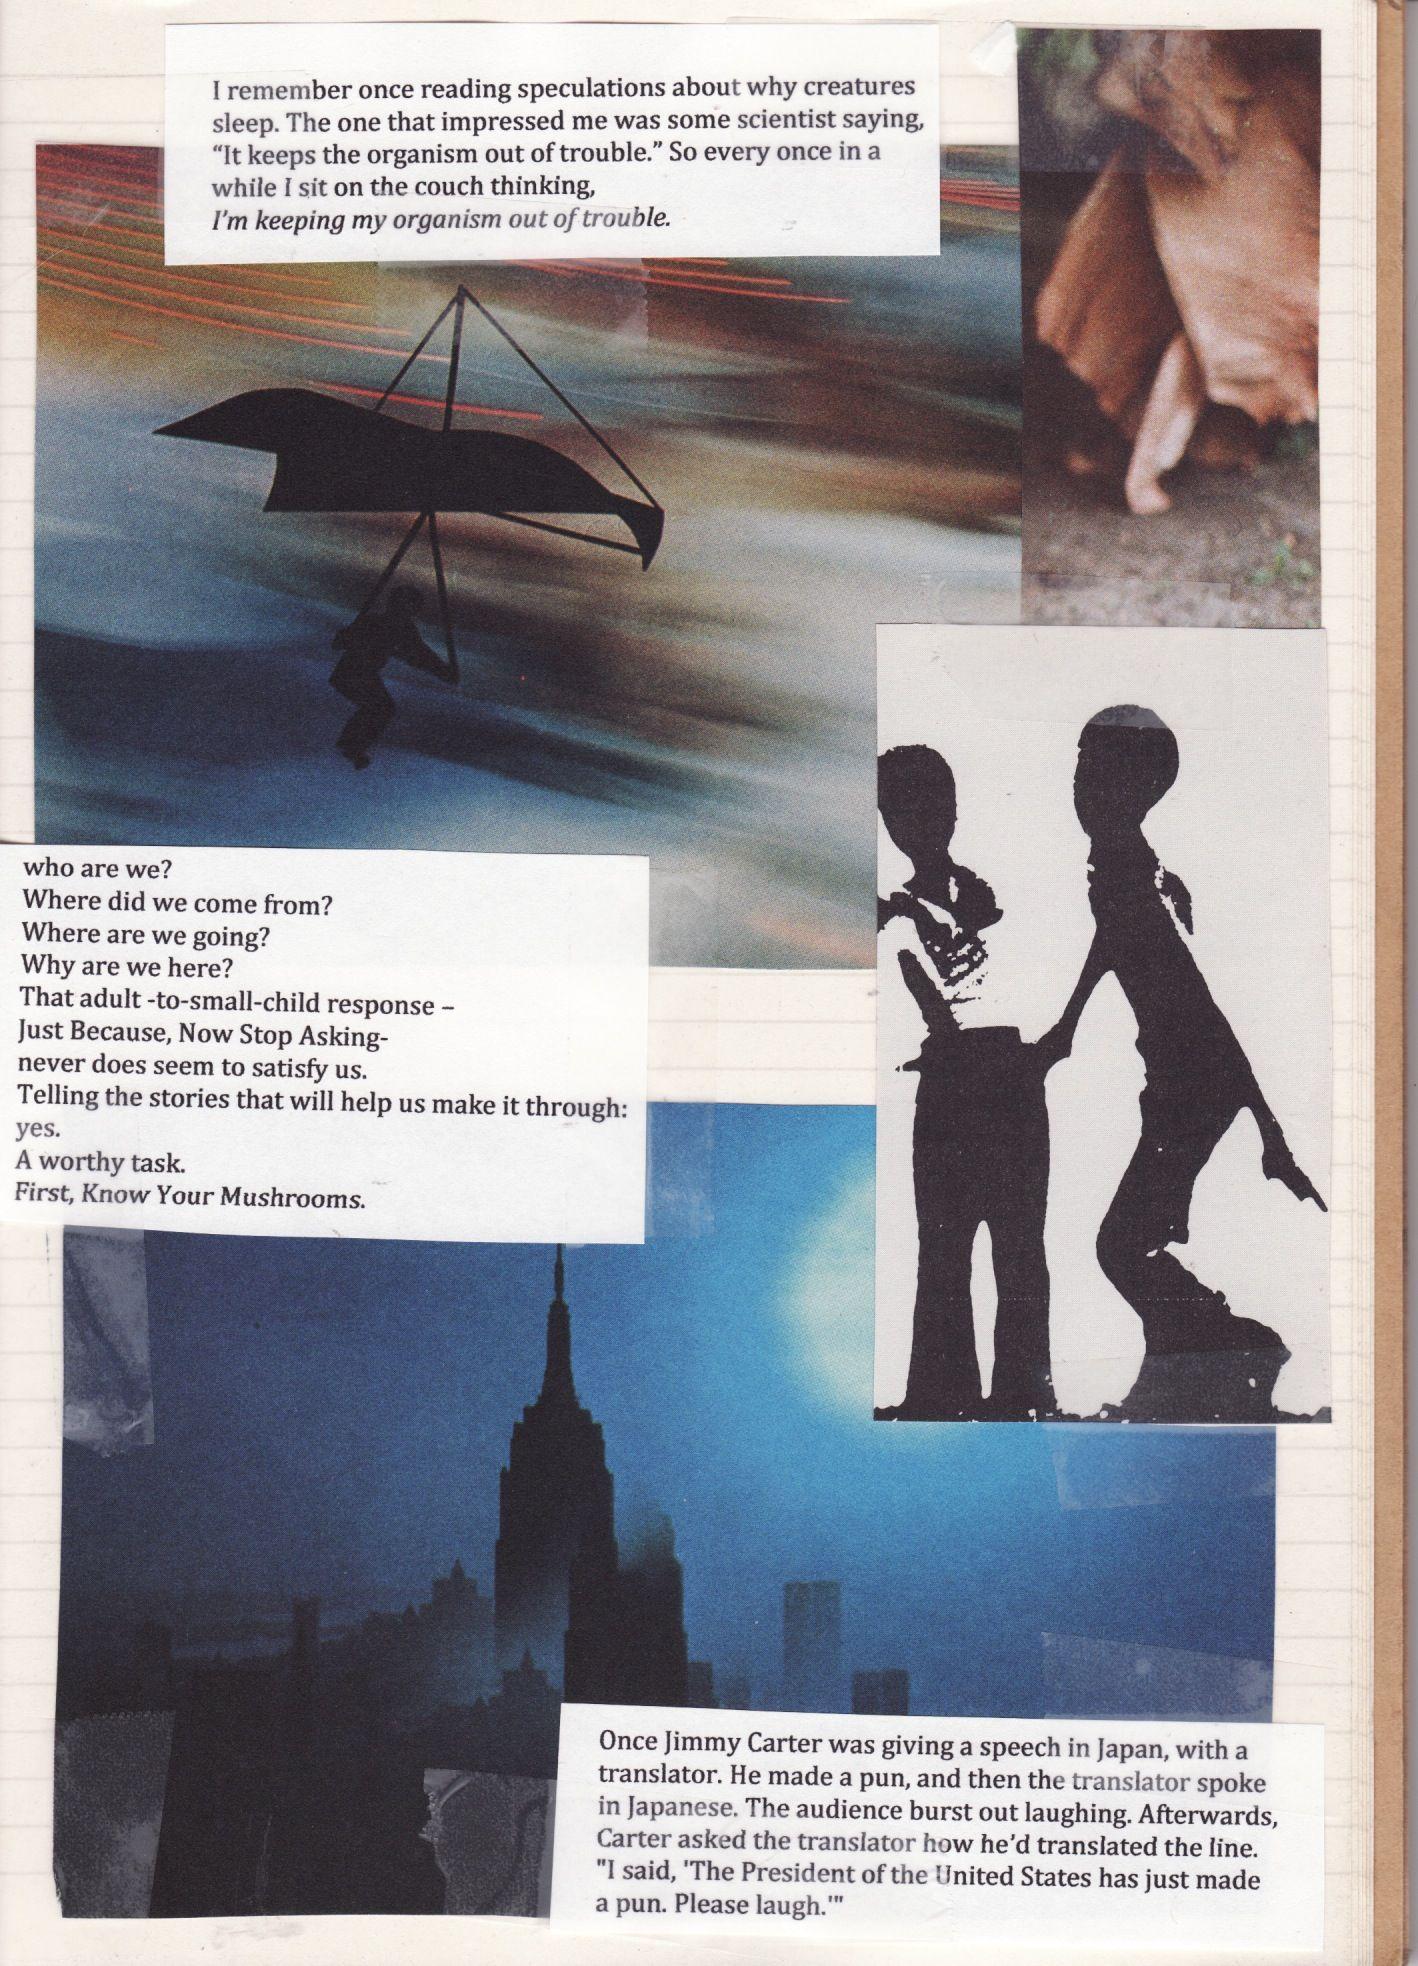 page-125-margaret-atwood-marilynne-robinson-translation